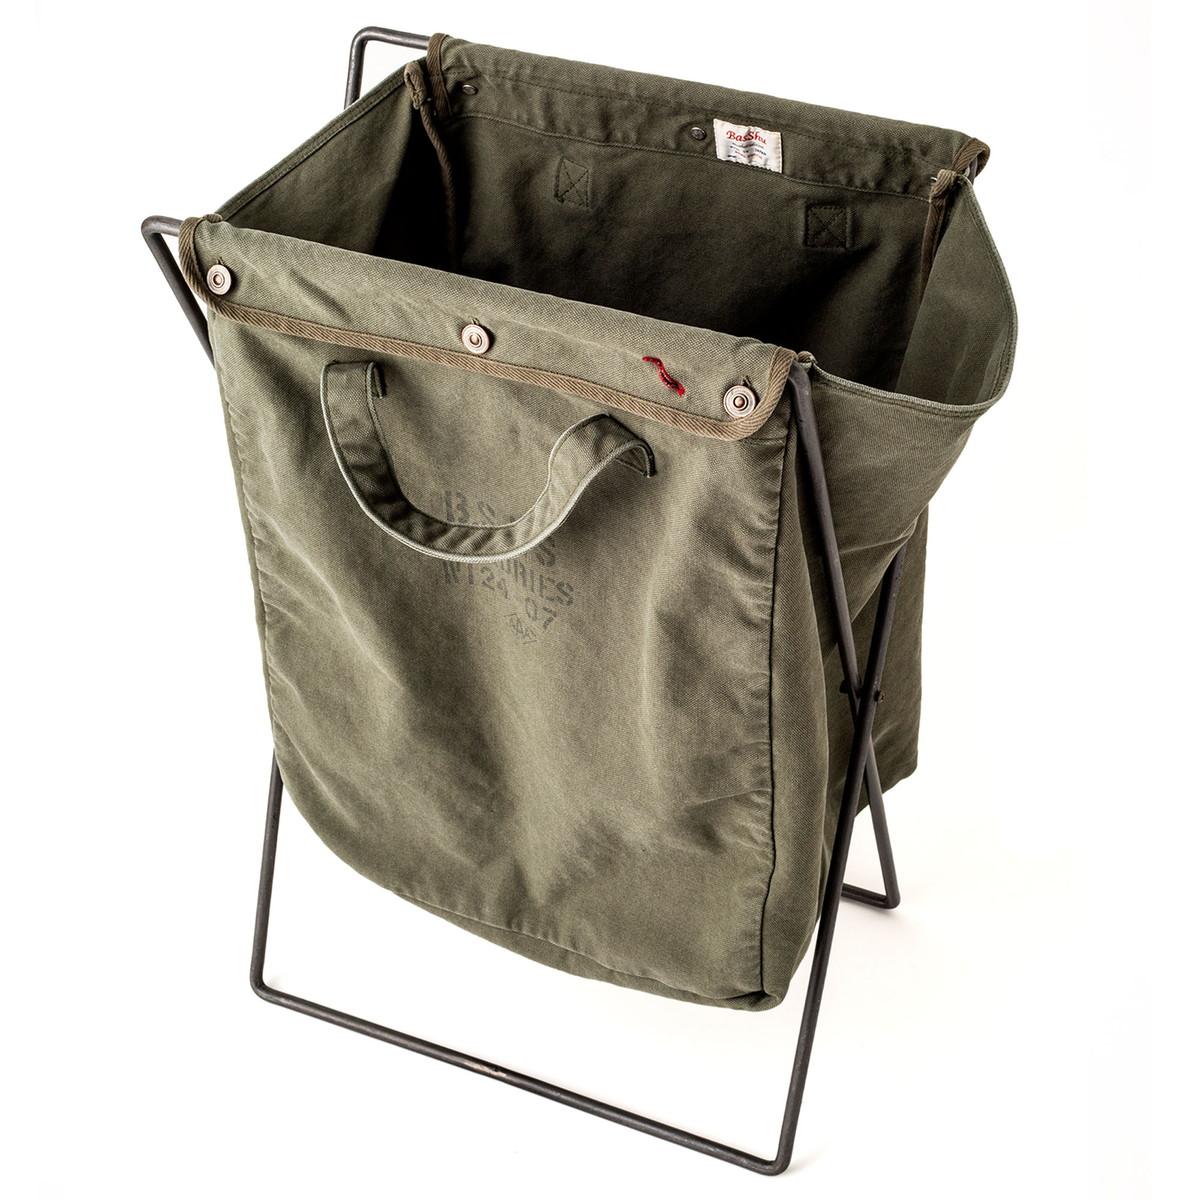 BasShu バッシュ ランドリーバッグ Laundry Bag